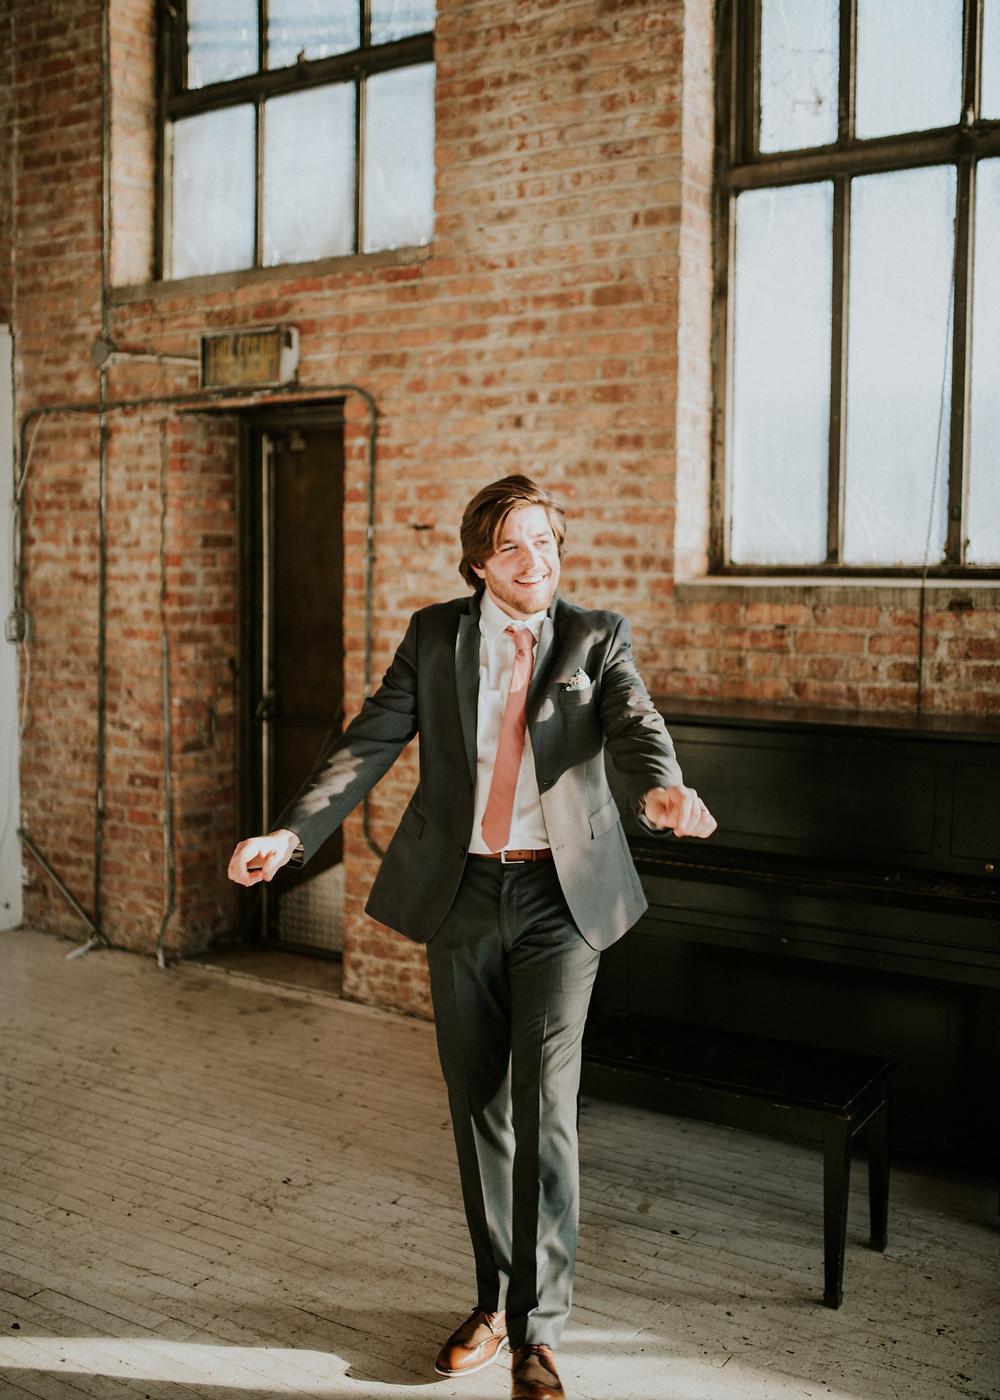 Chicago Groom on wedding day